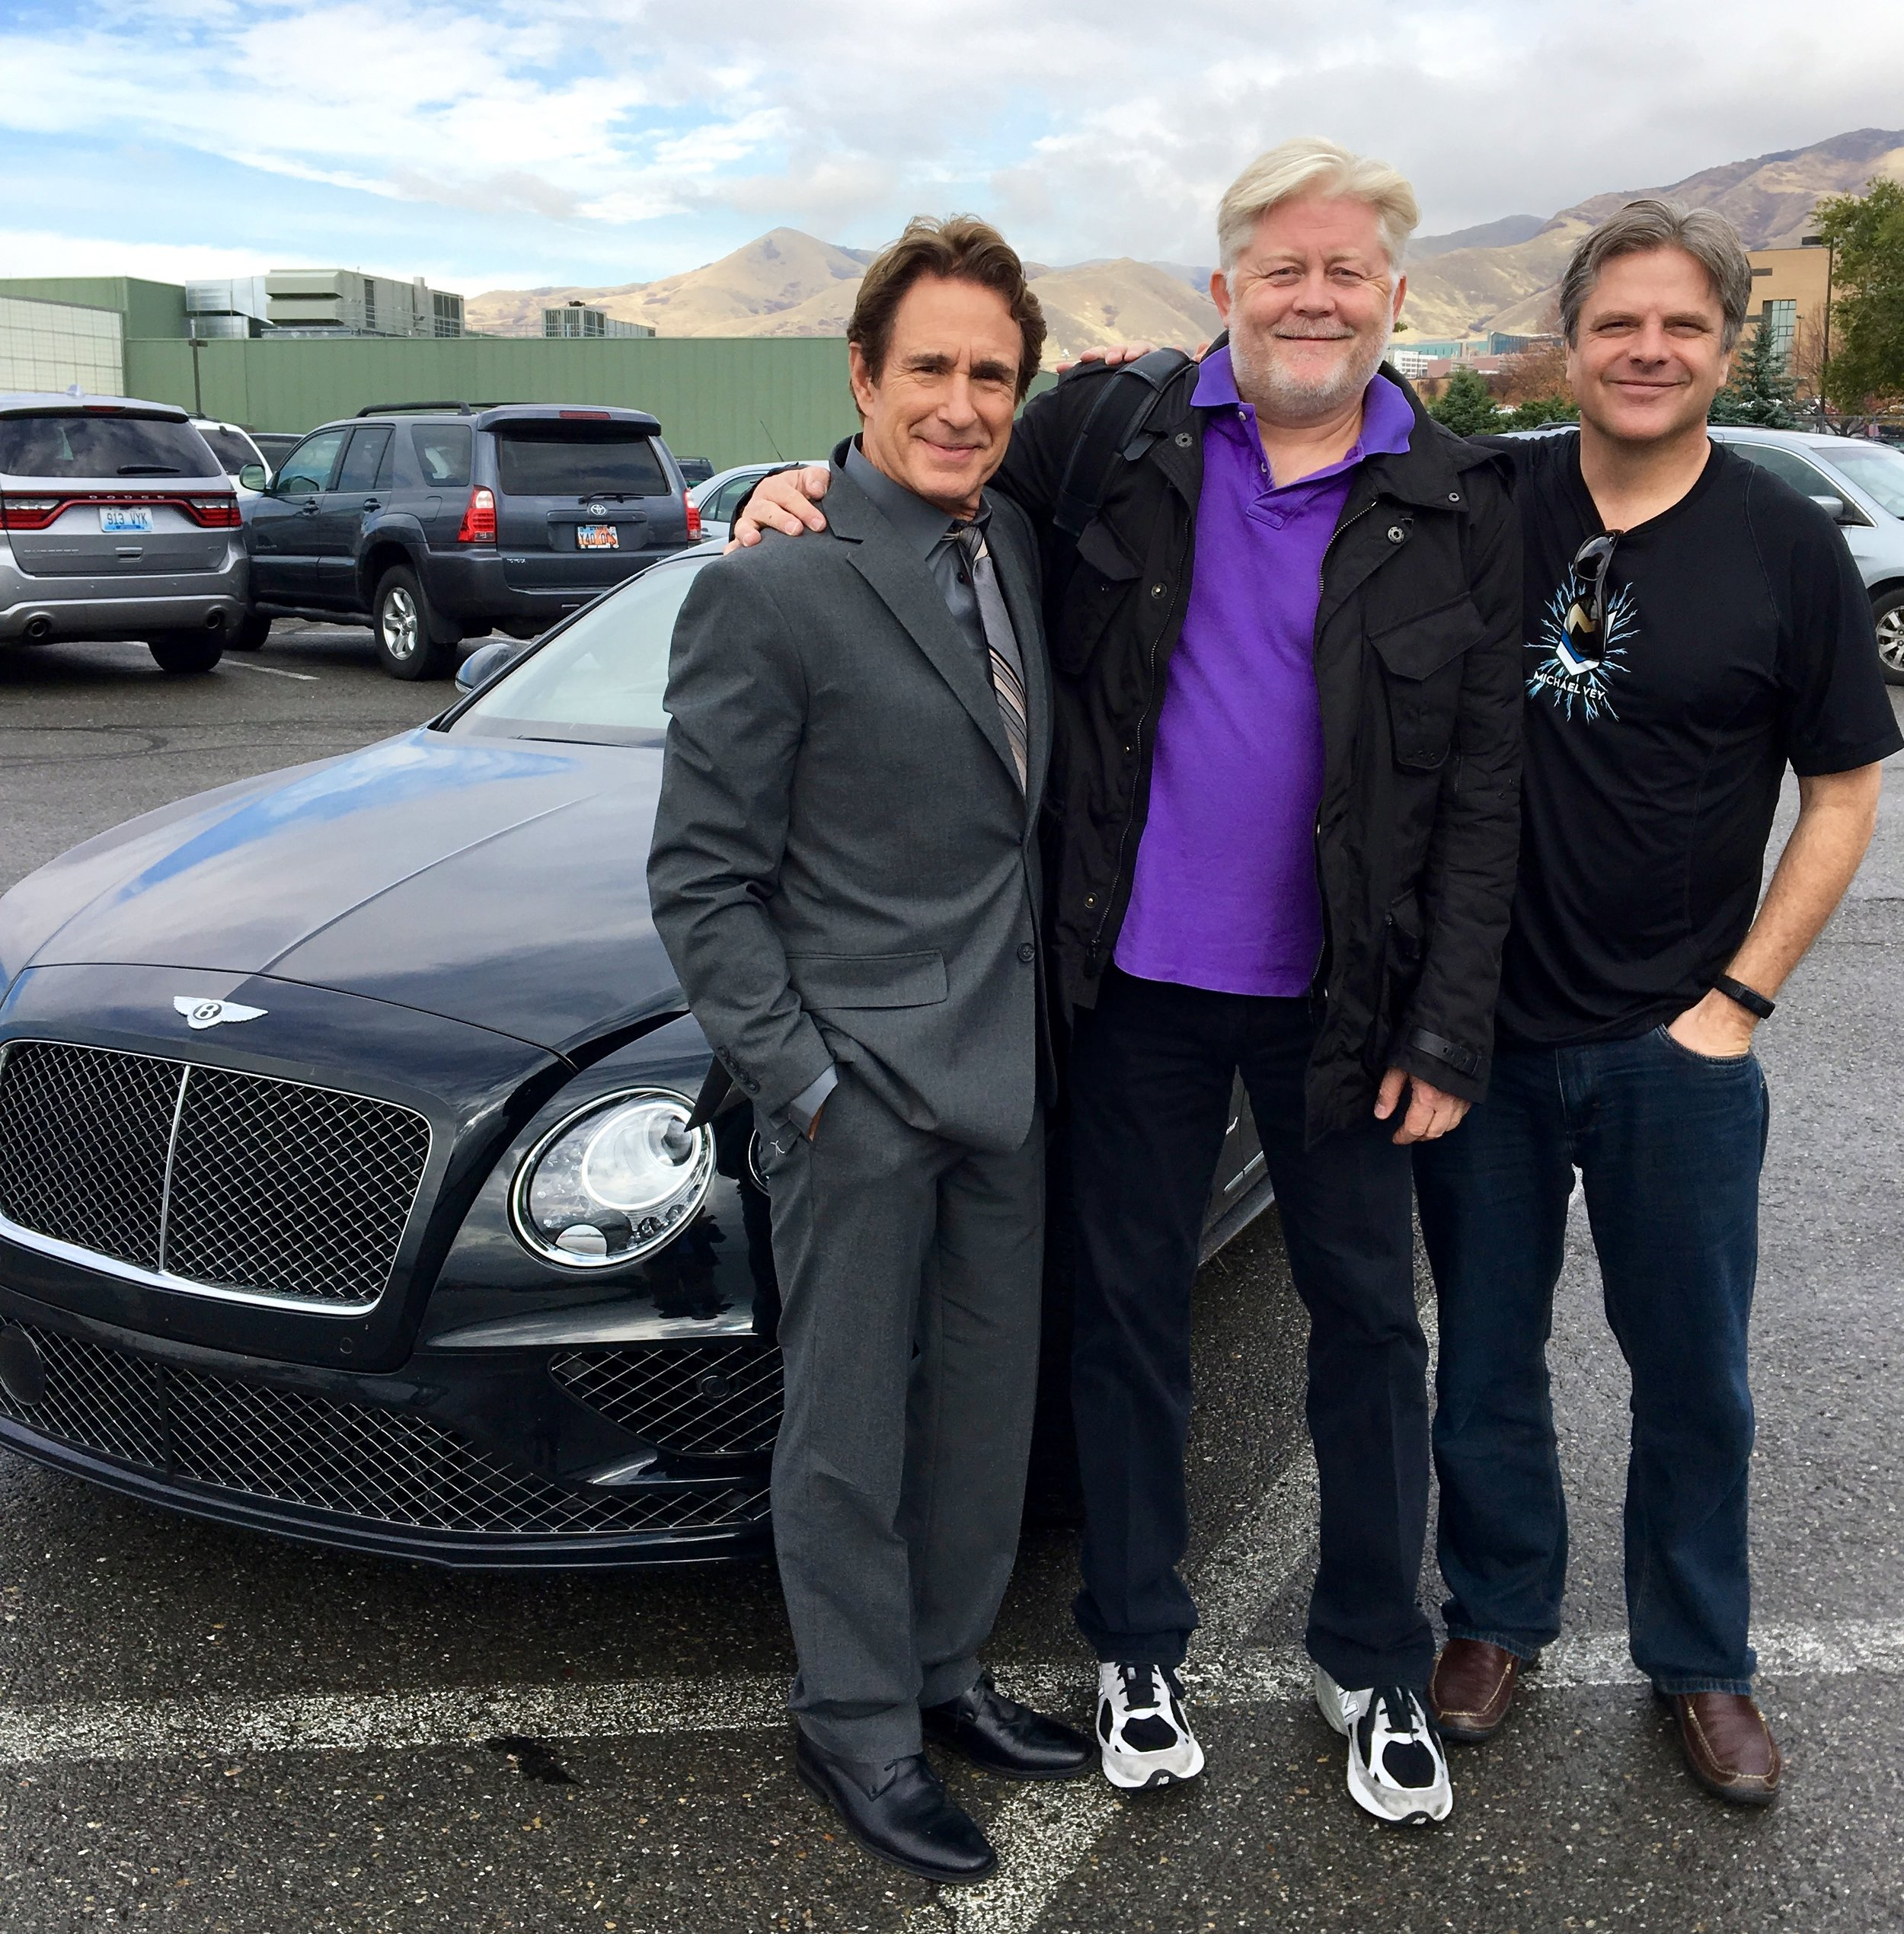 John Shea, McKay Daines and Richard Paul Evans meeting on Michael Vey production